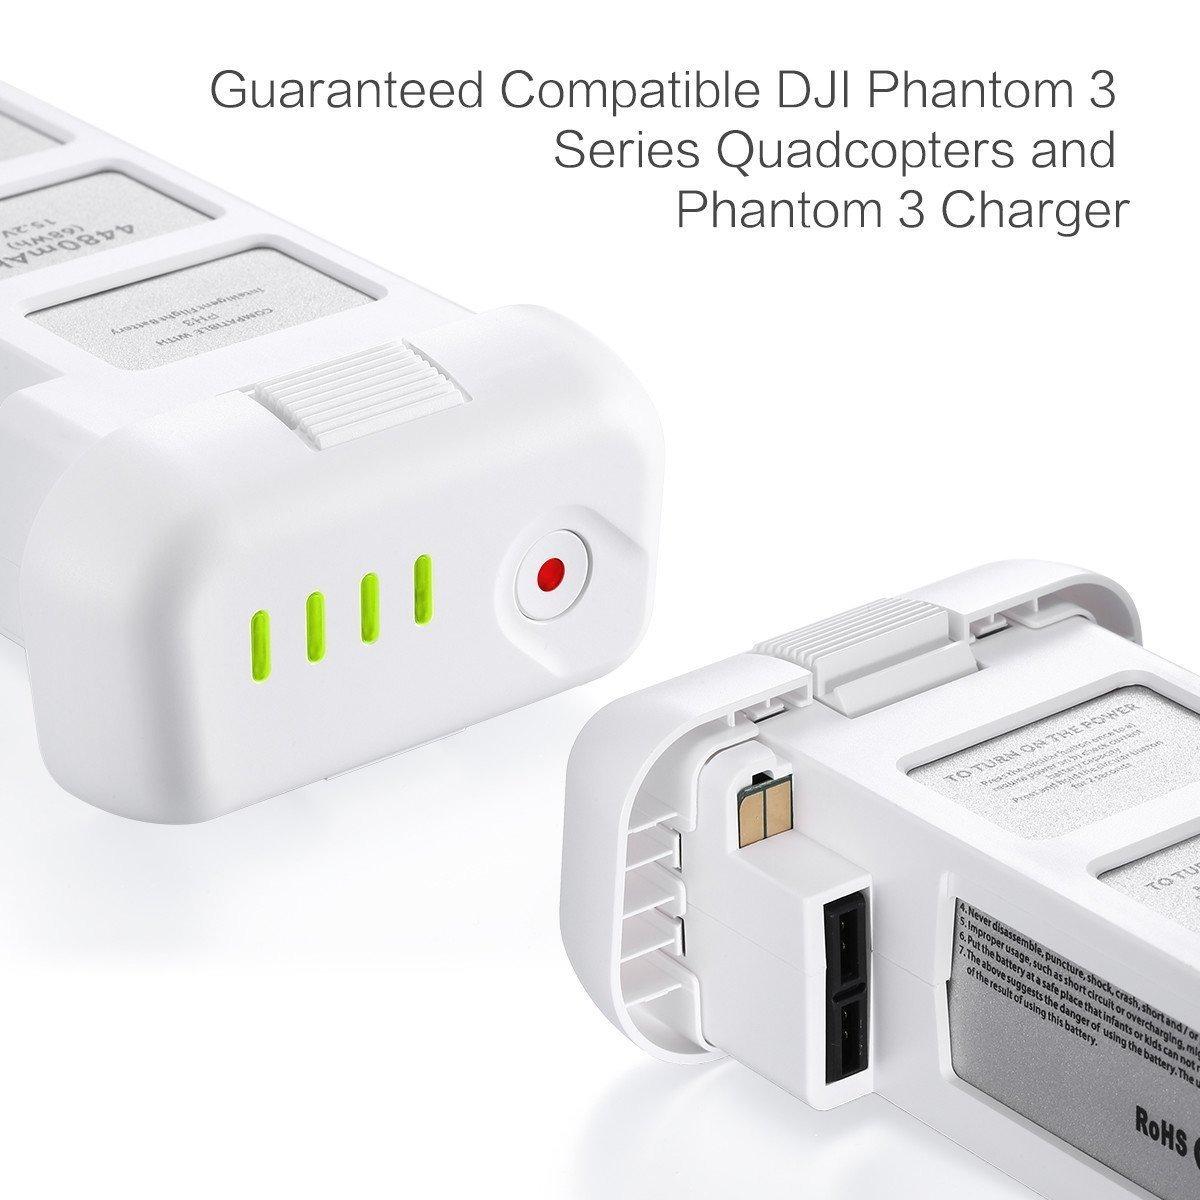 4480mAh 15.2V Battery For DJI Phantom 3 4K Professional Advanced LiPo TO